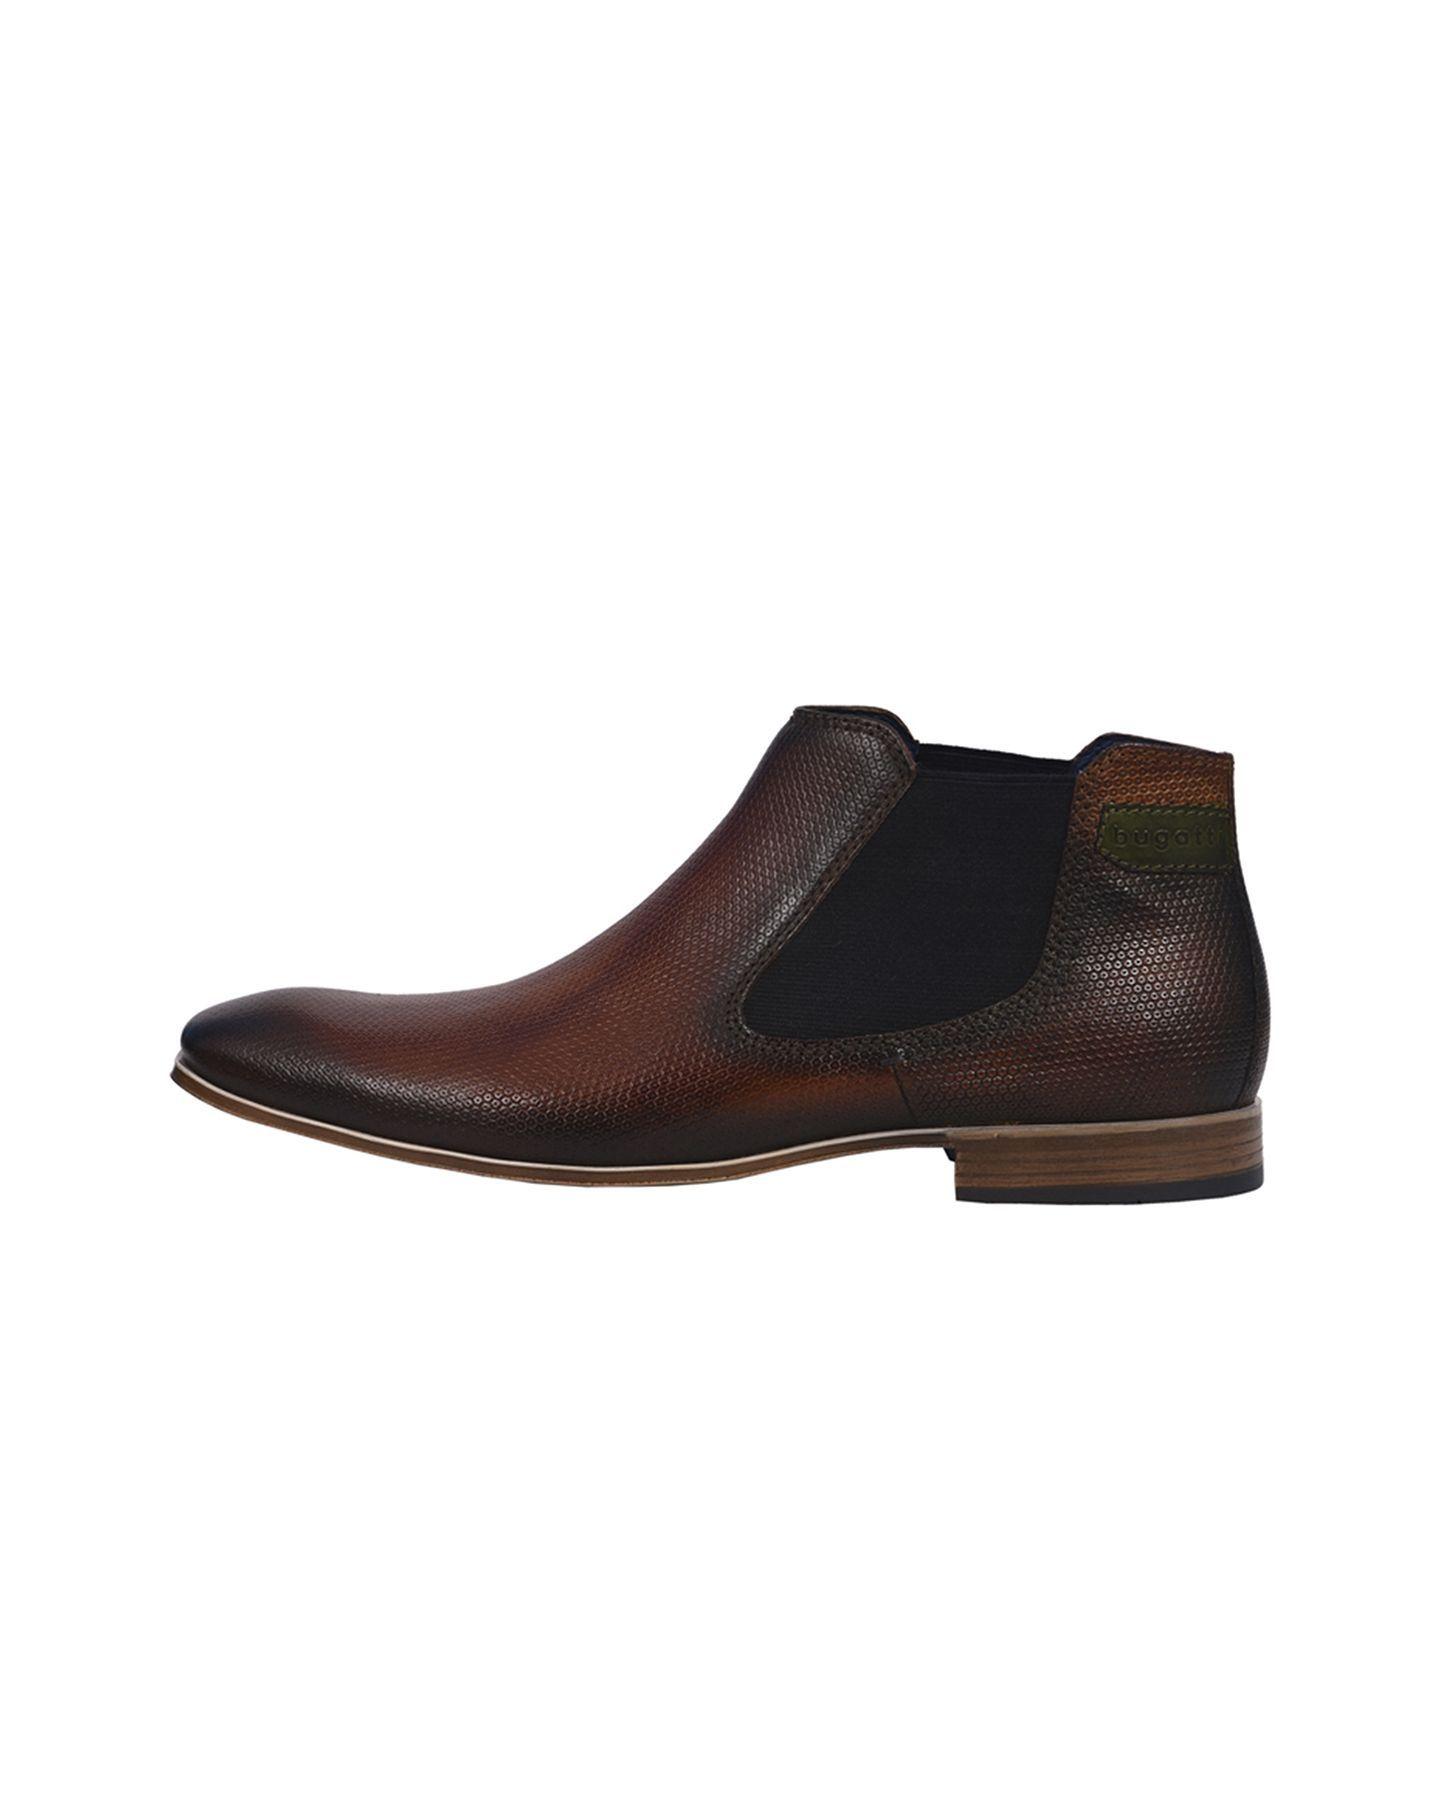 bugatti Chelsea boots in cognac in Größe 45